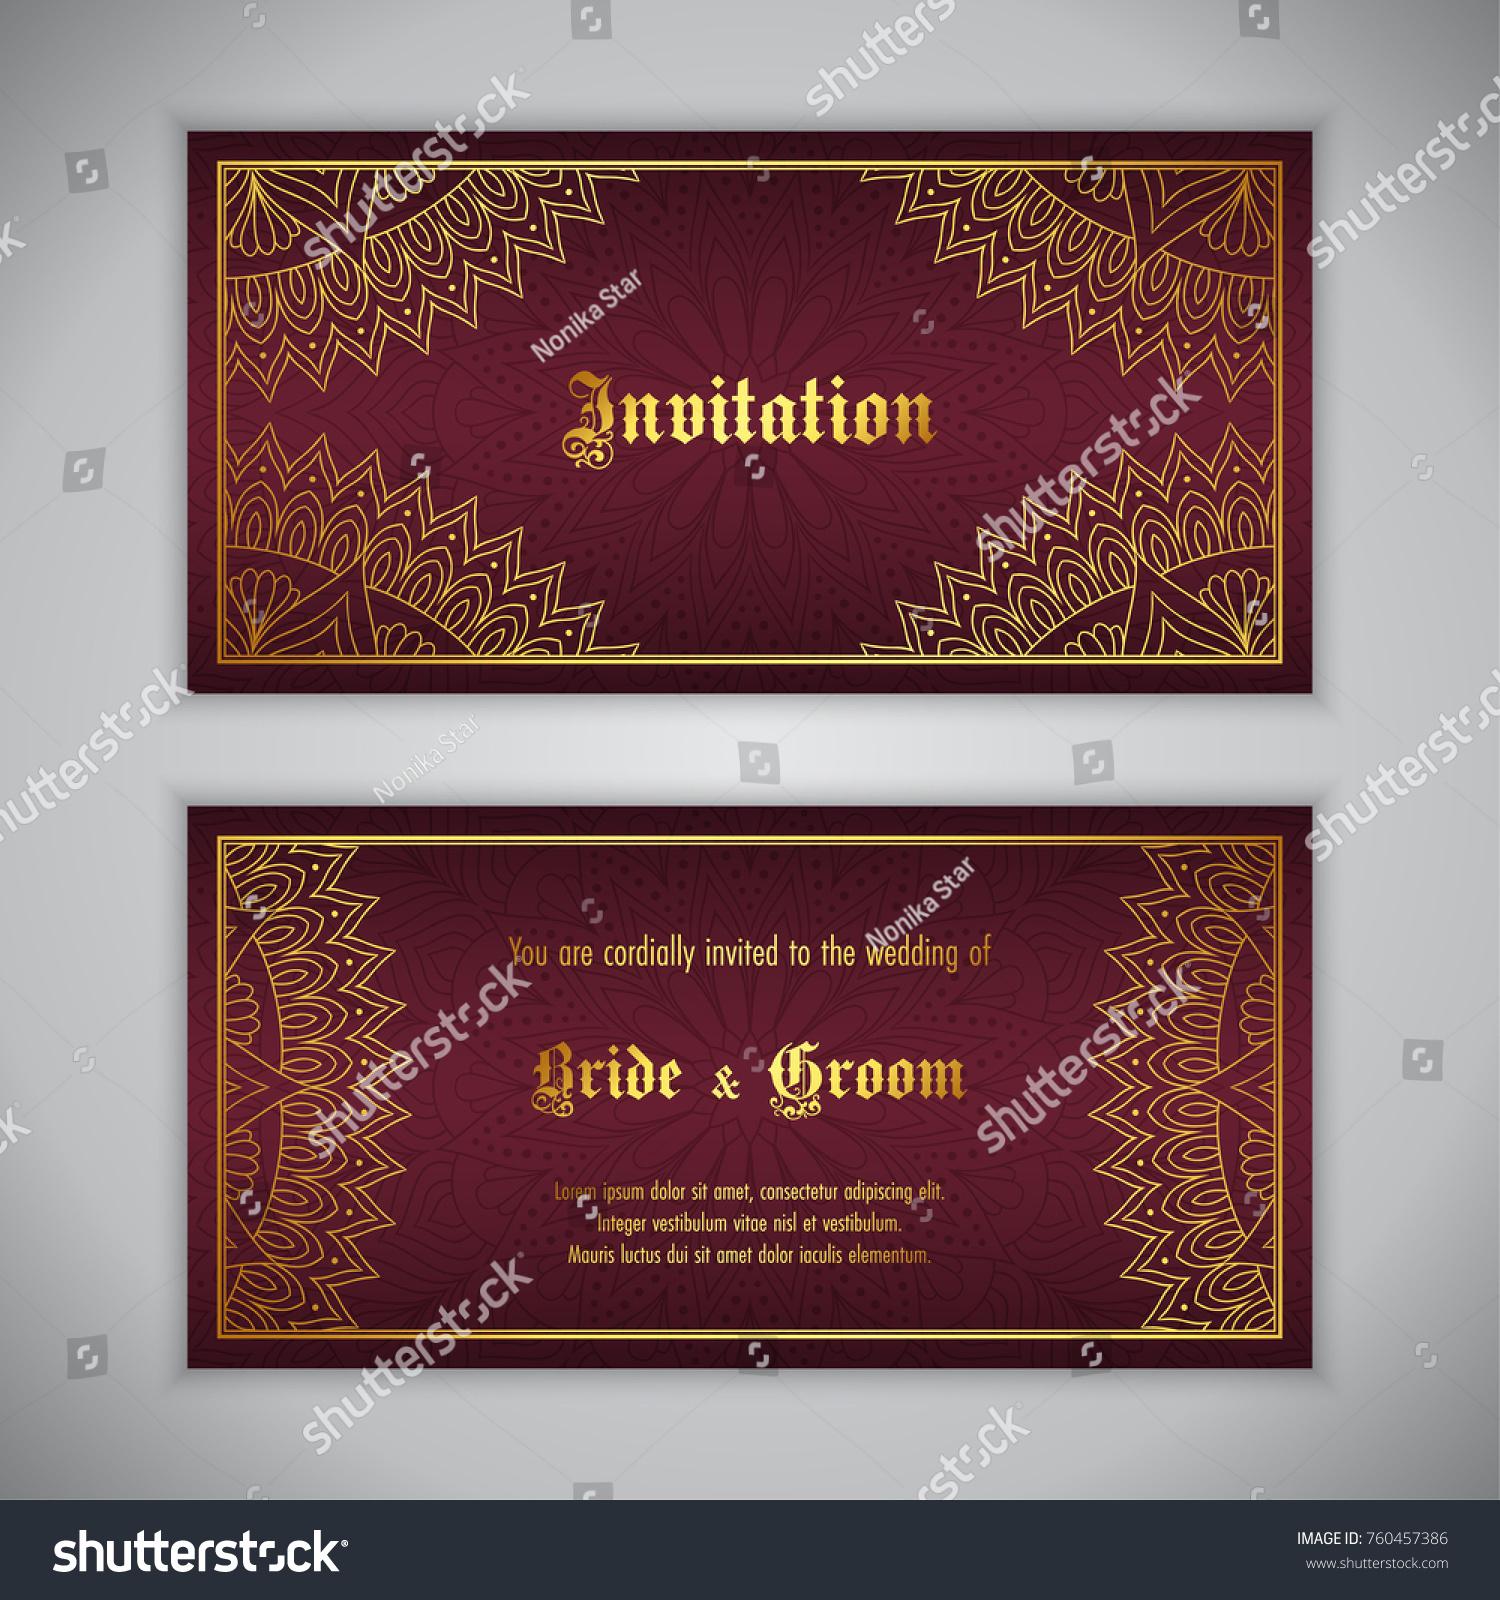 Luxury wedding invitation with golden ornament. Vector illustration ...